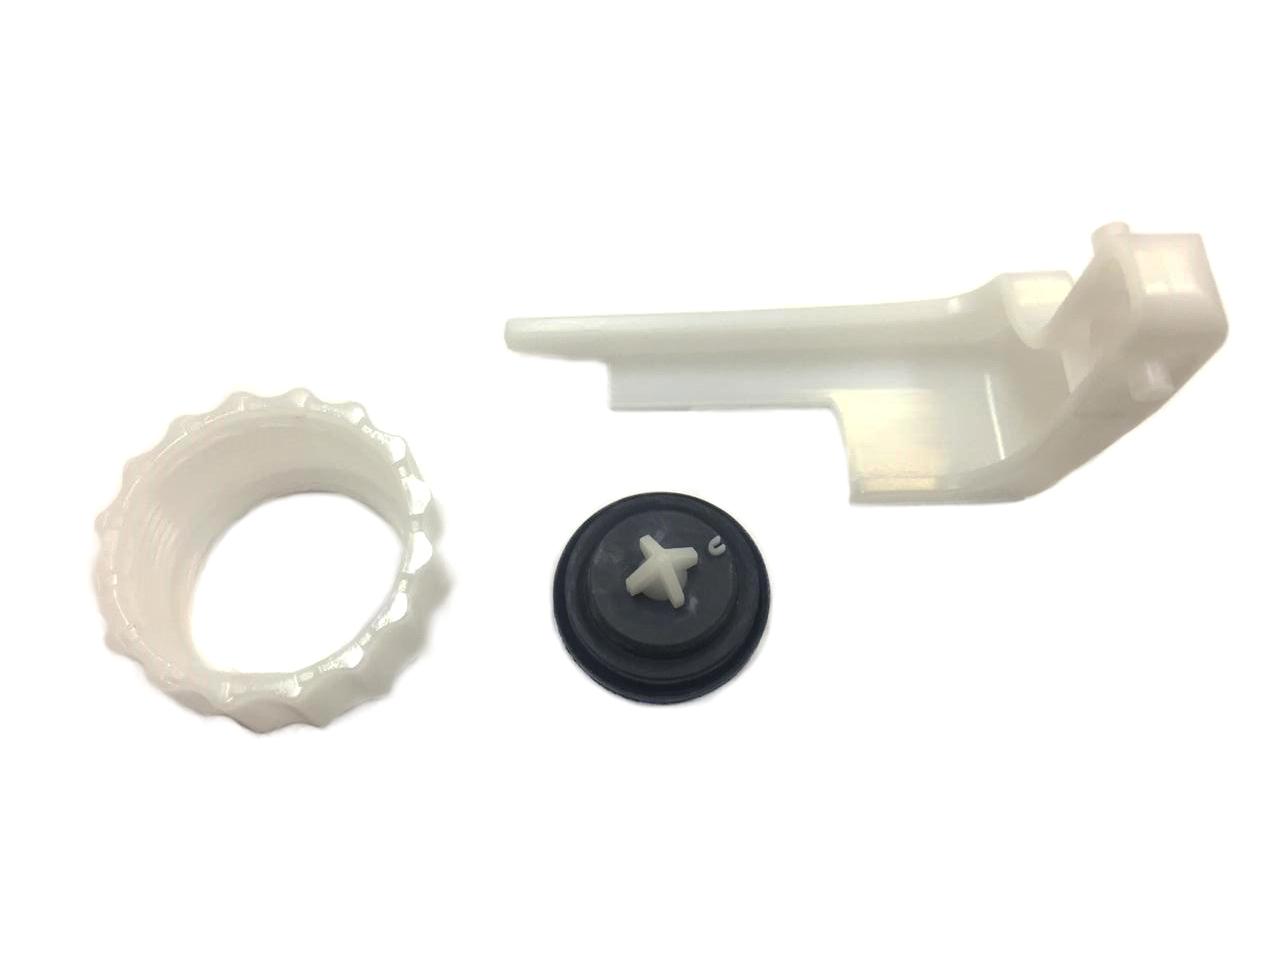 Рем комплект заливного клапана арматуры унитаза Ideal Standard